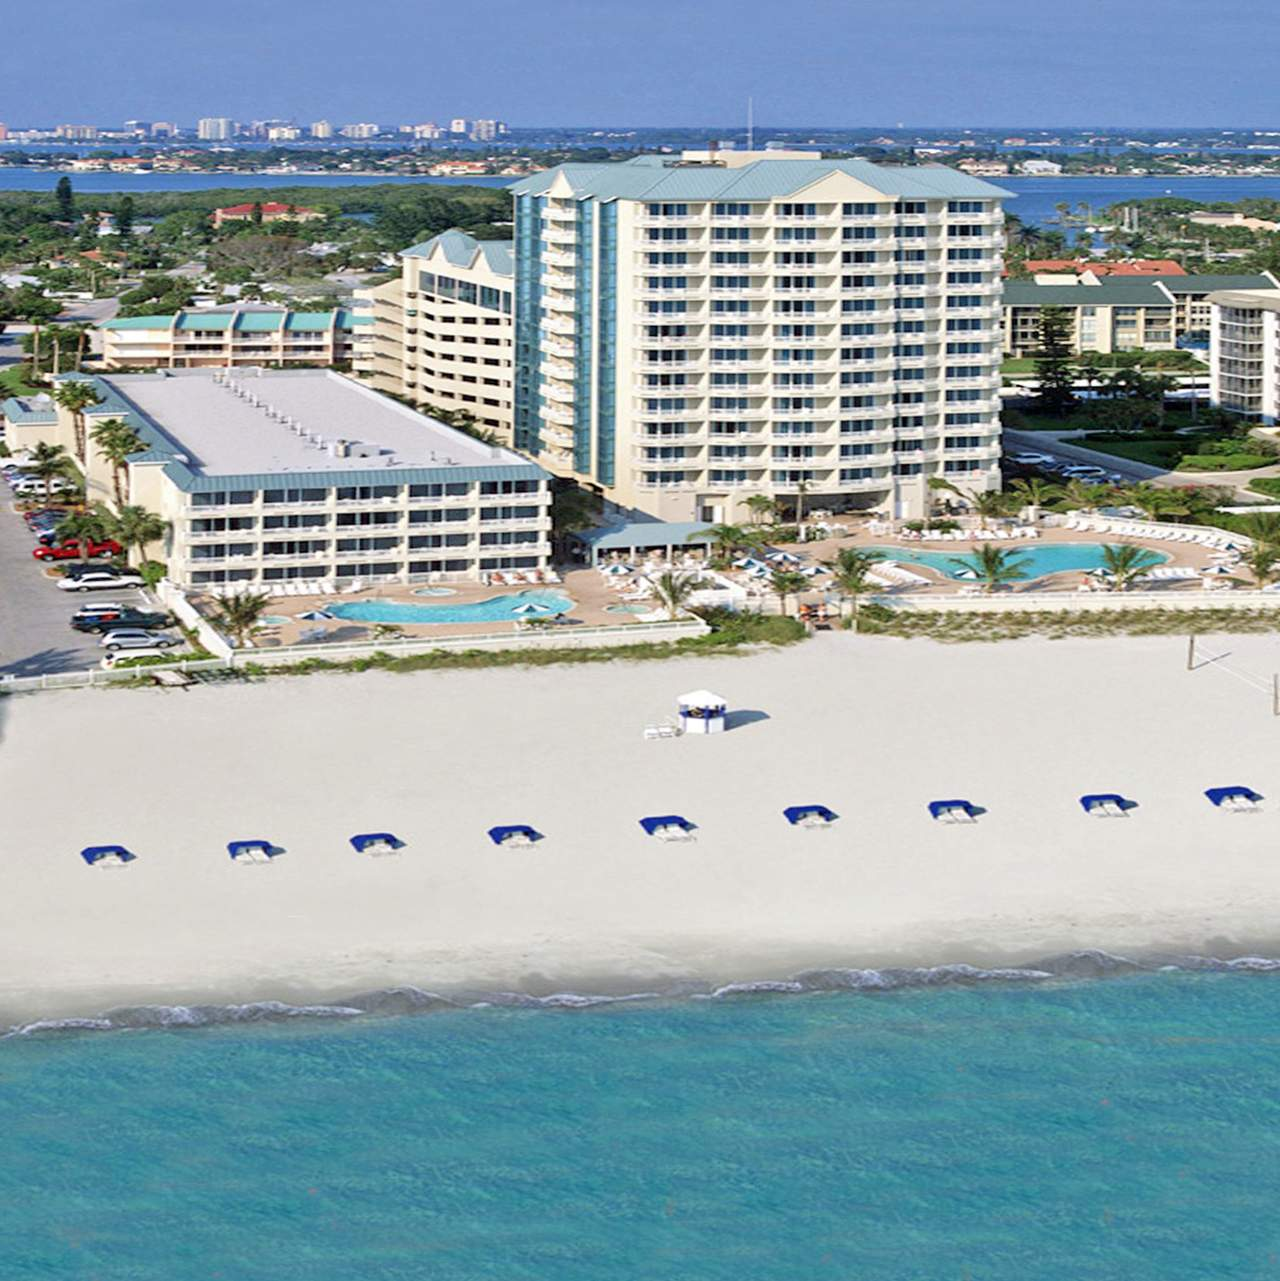 hotel florida lido beach resort canusa. Black Bedroom Furniture Sets. Home Design Ideas